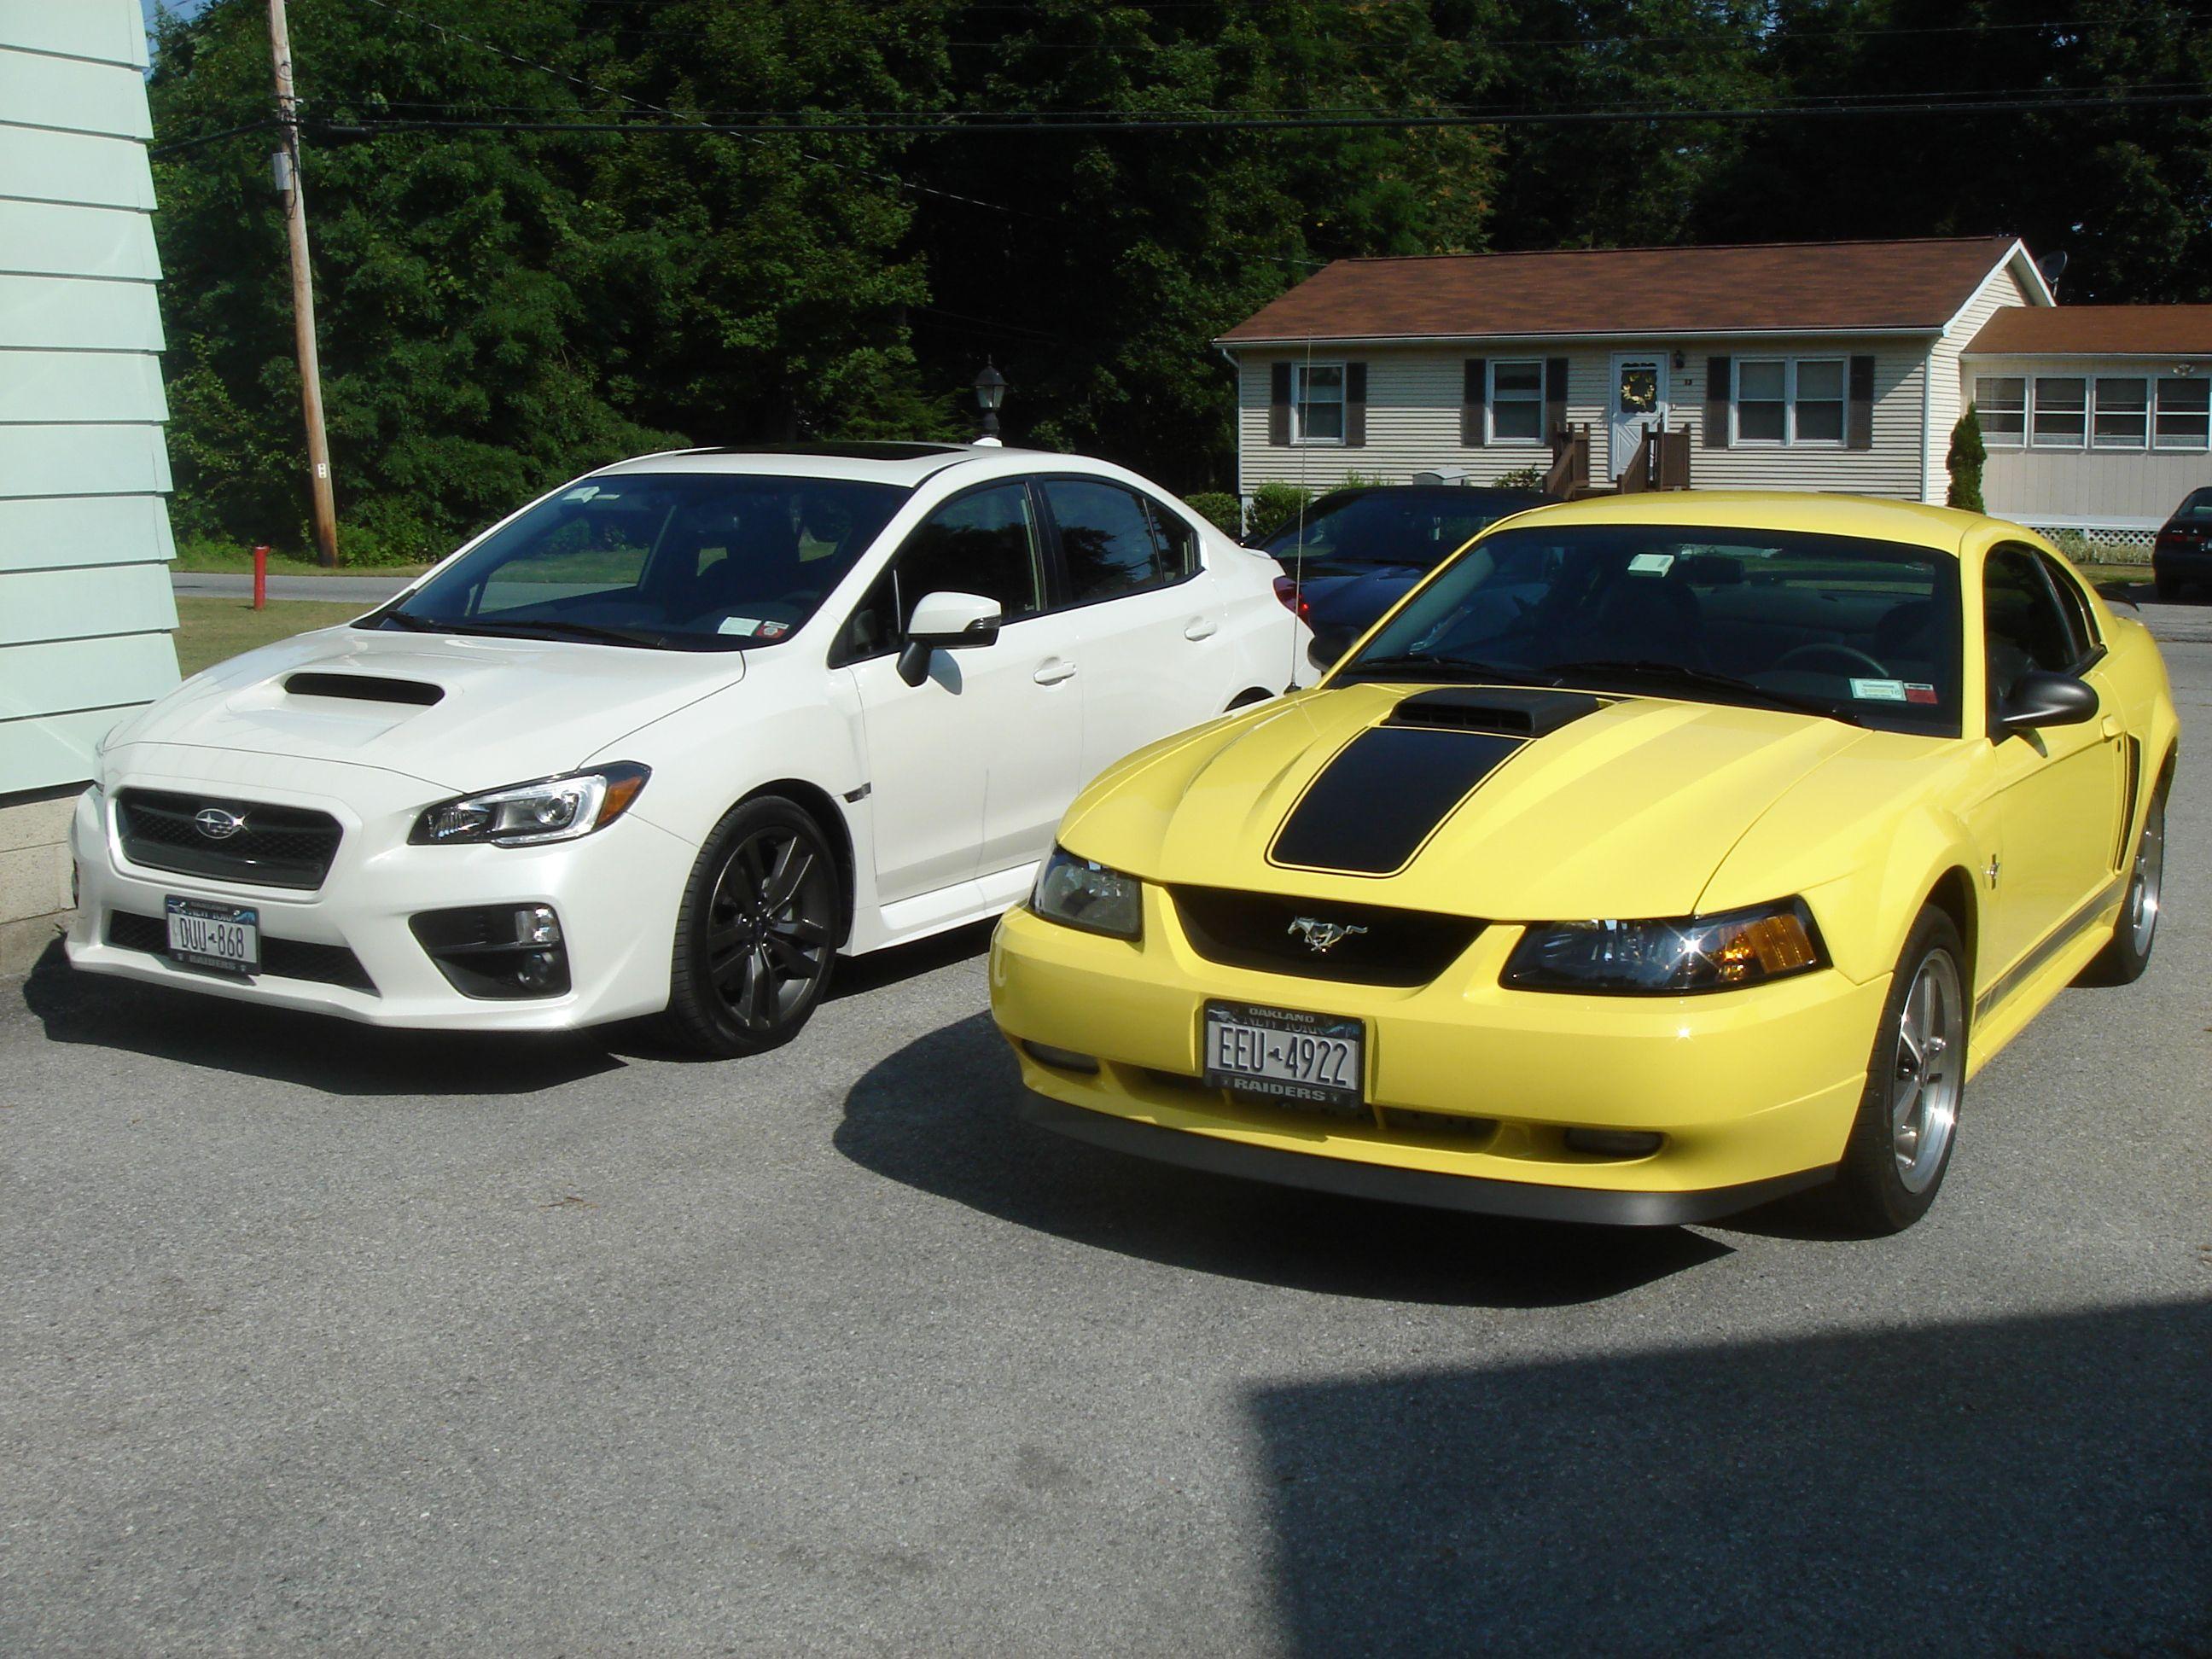 2016 Subaru WRX and 2003 Mustang Mach 1 Cars Pinterest